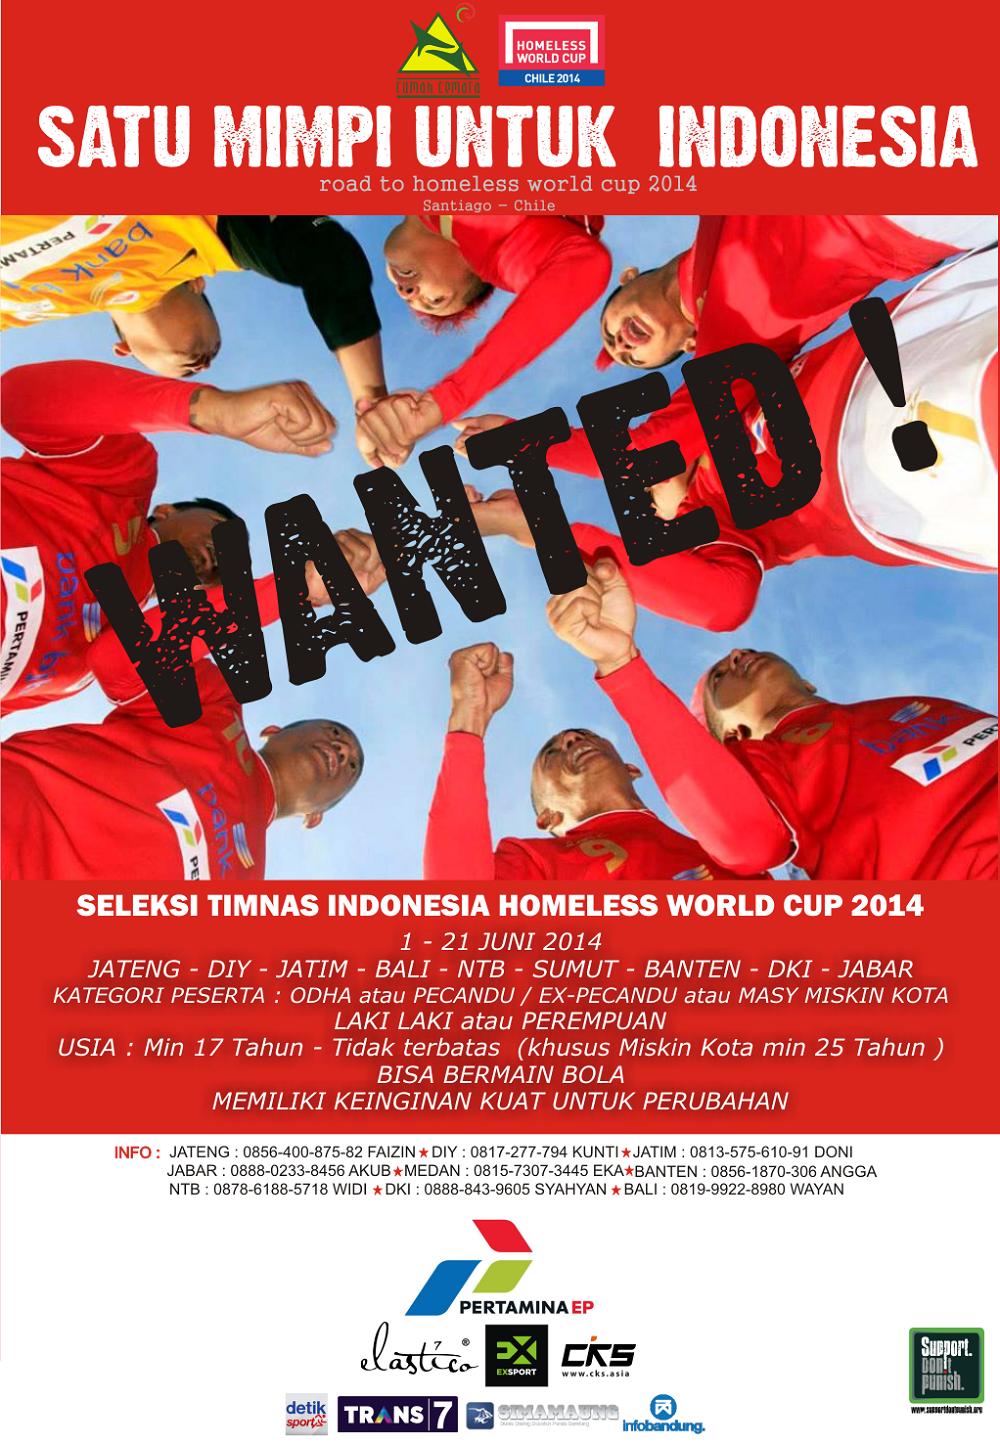 Seleksi Timnas indonesia Homeless World Cup 2014